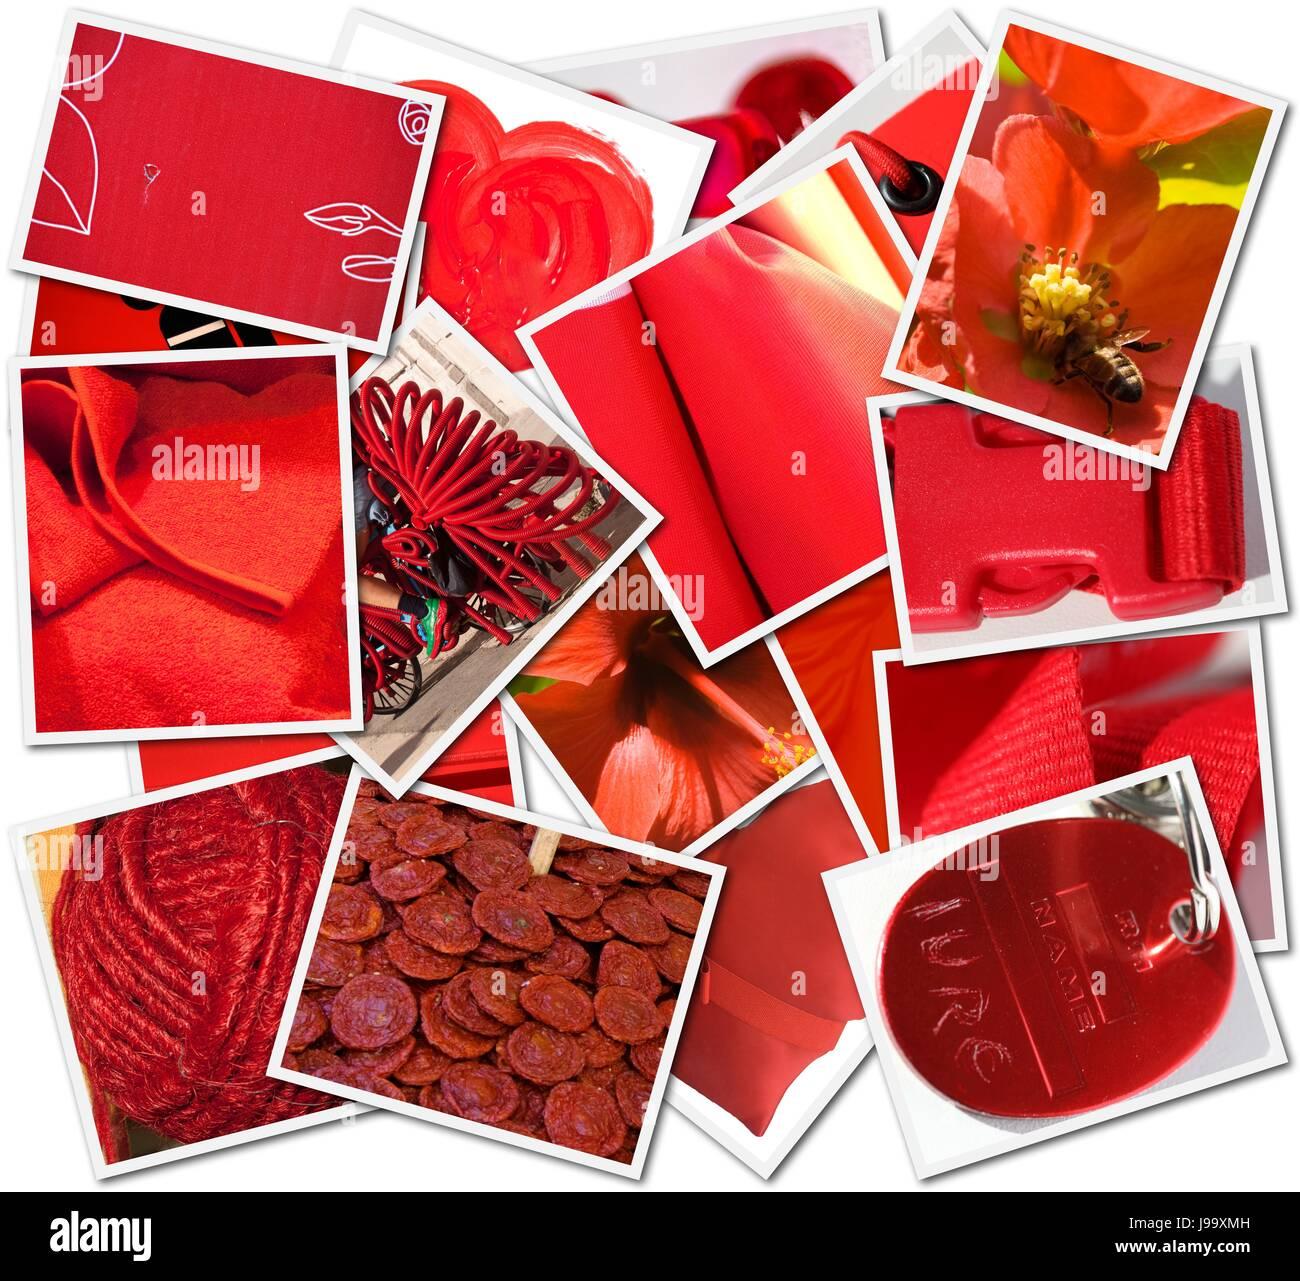 Objekt, Farbe, Collage, Fotos, Farbe, Bilder, Montage, Montage, rot, Stockbild